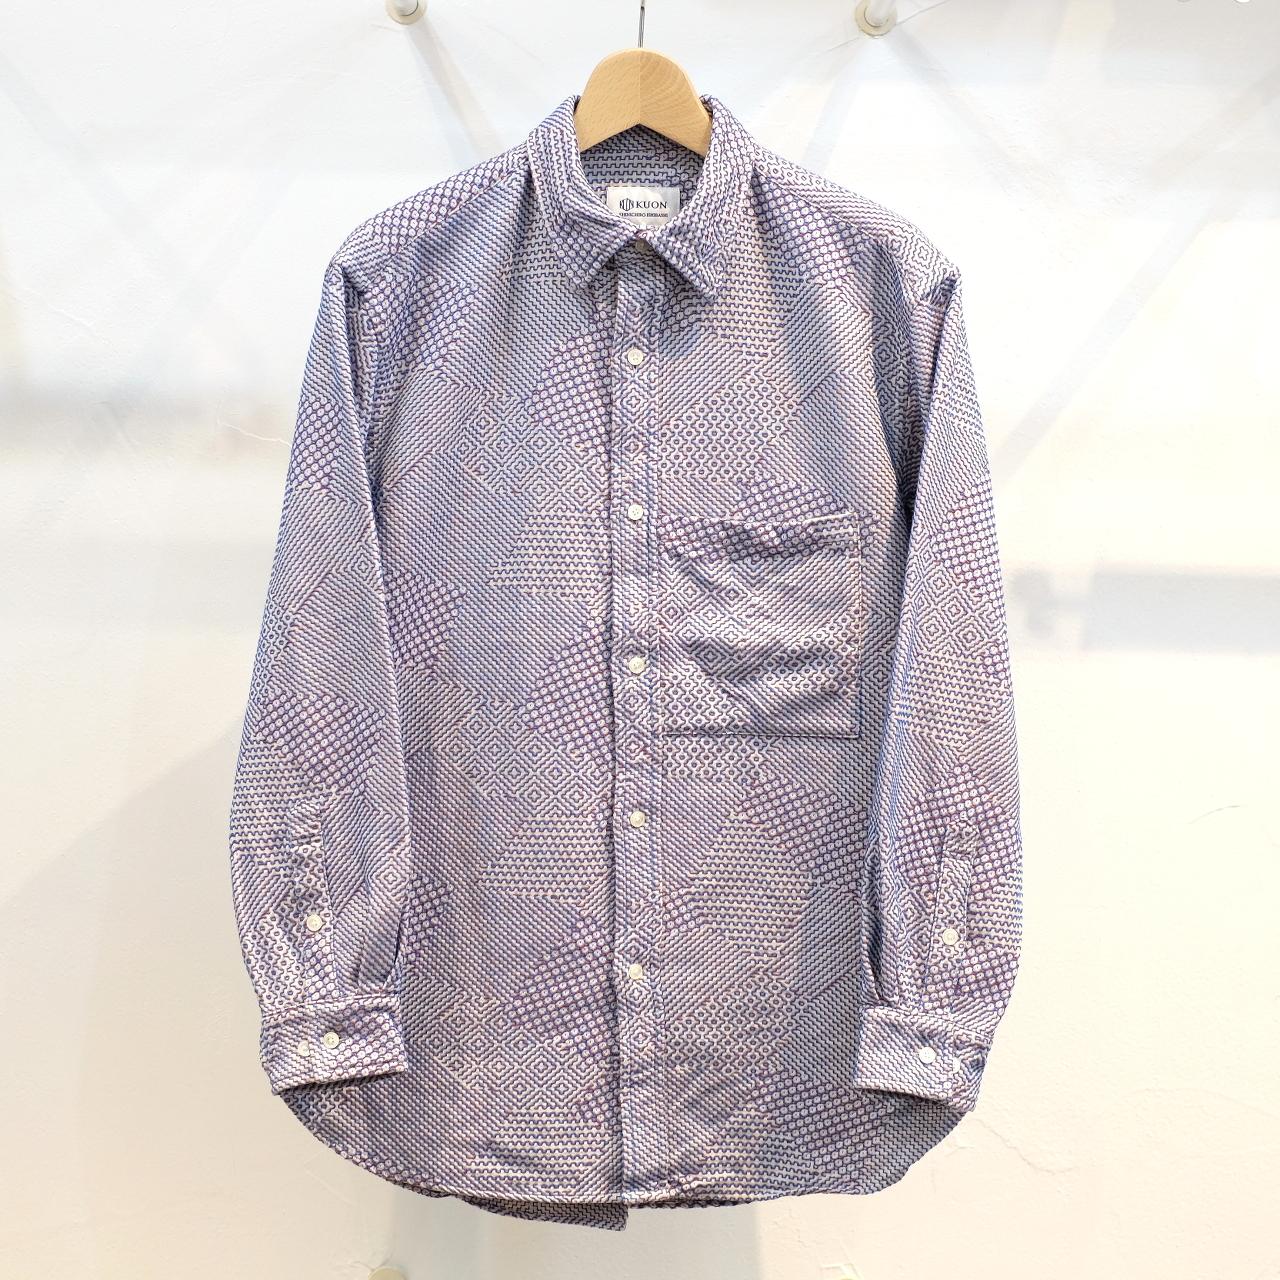 KUON(クオン) 紋刺し子織 セミロングシャツ